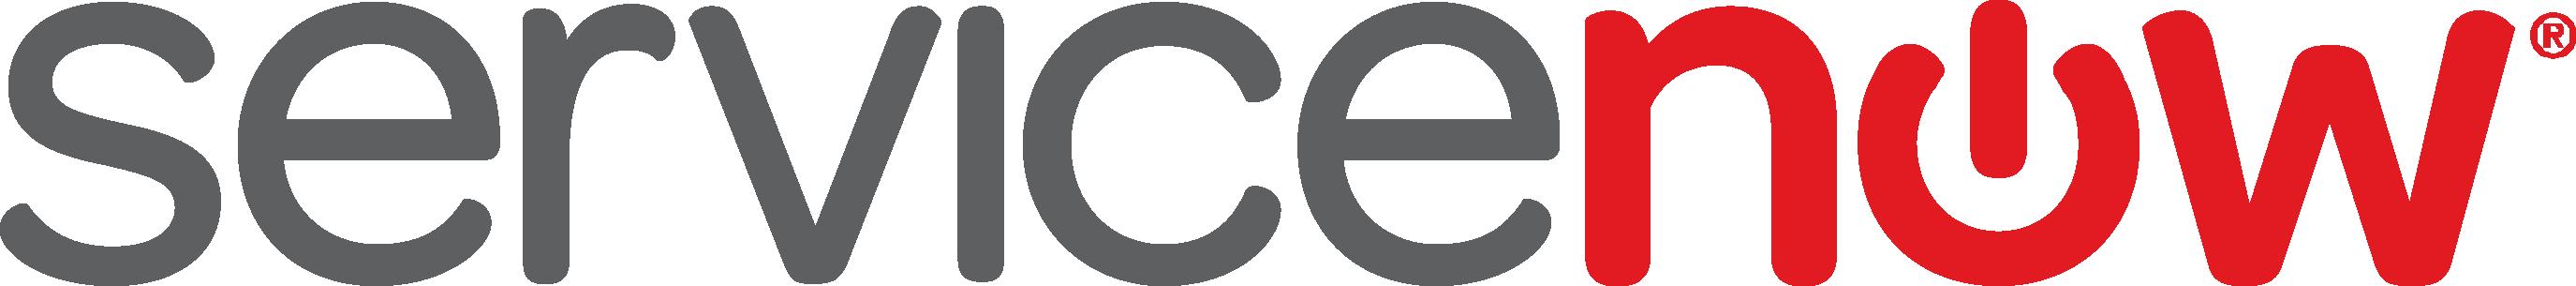 ServiceNow Logo Download Vector.